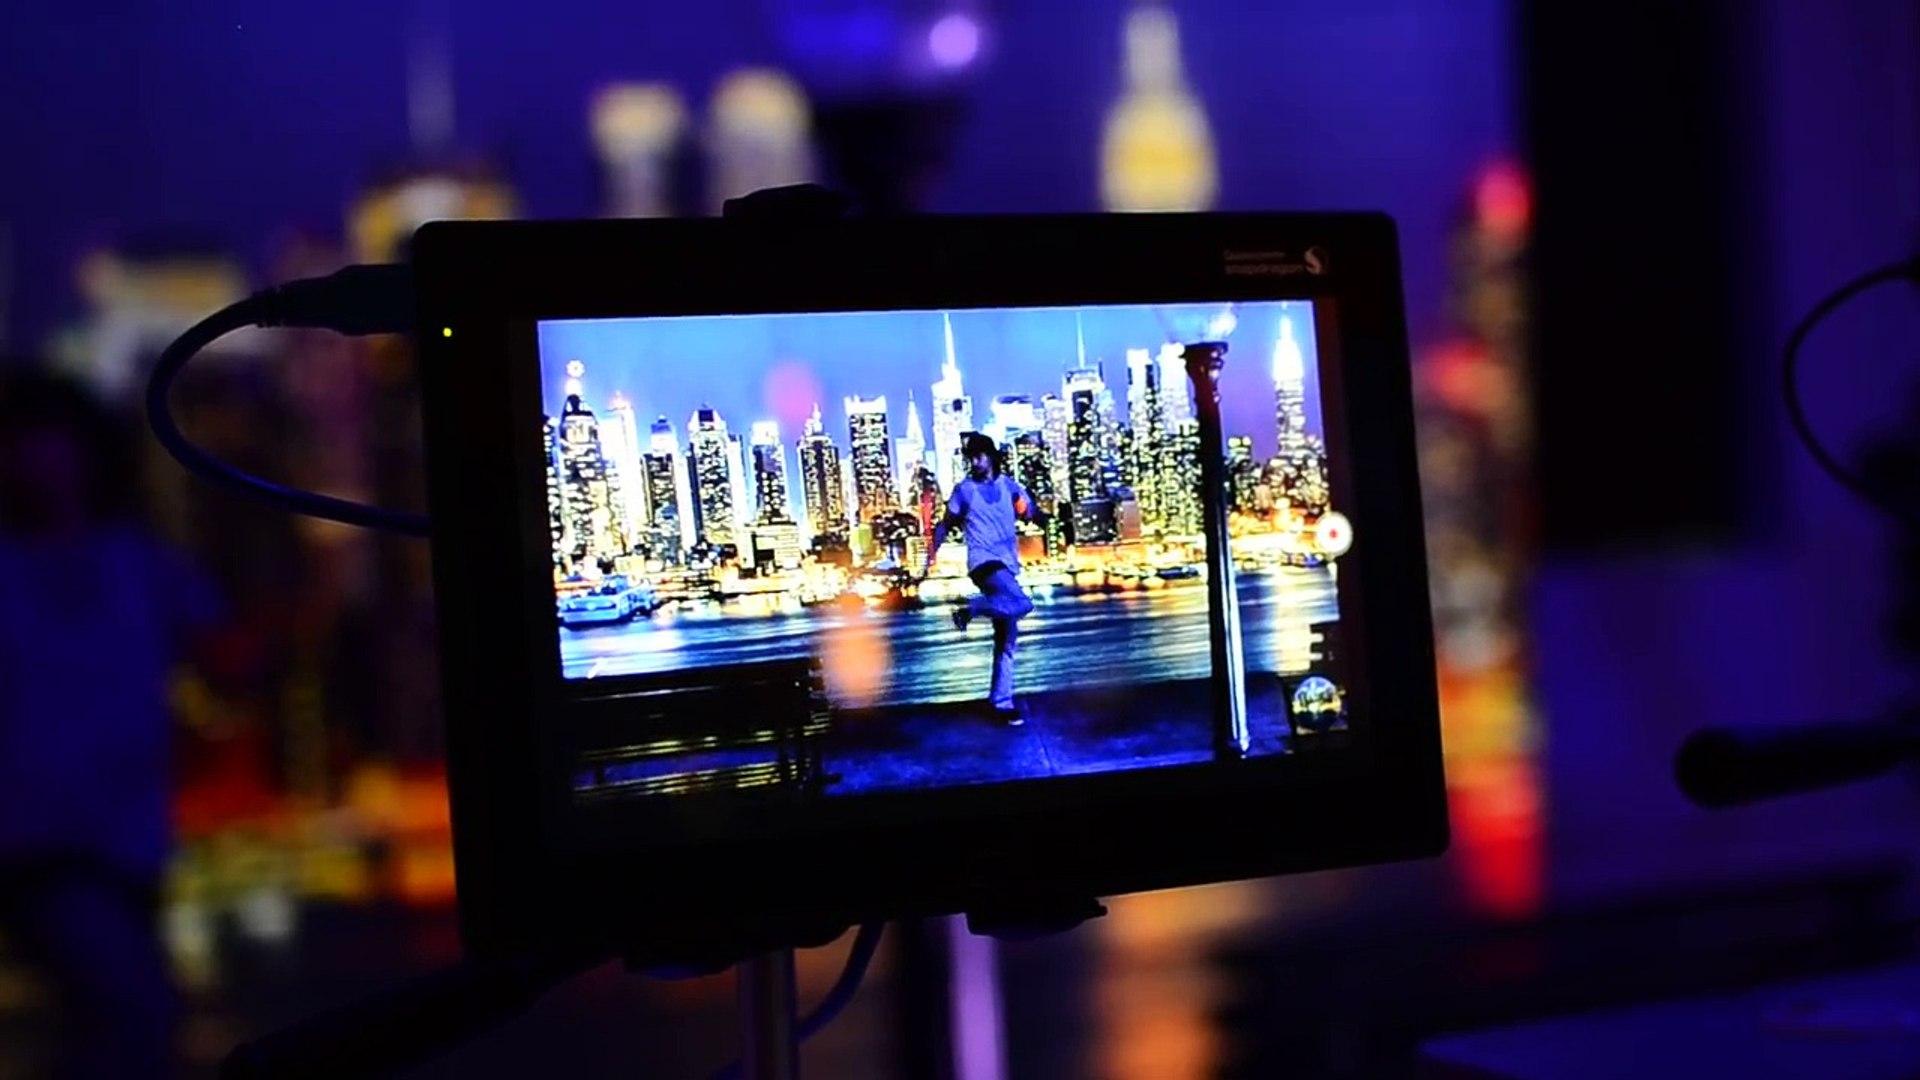 Qualcomm Snapdragon 820 Low Light Video Enhancement